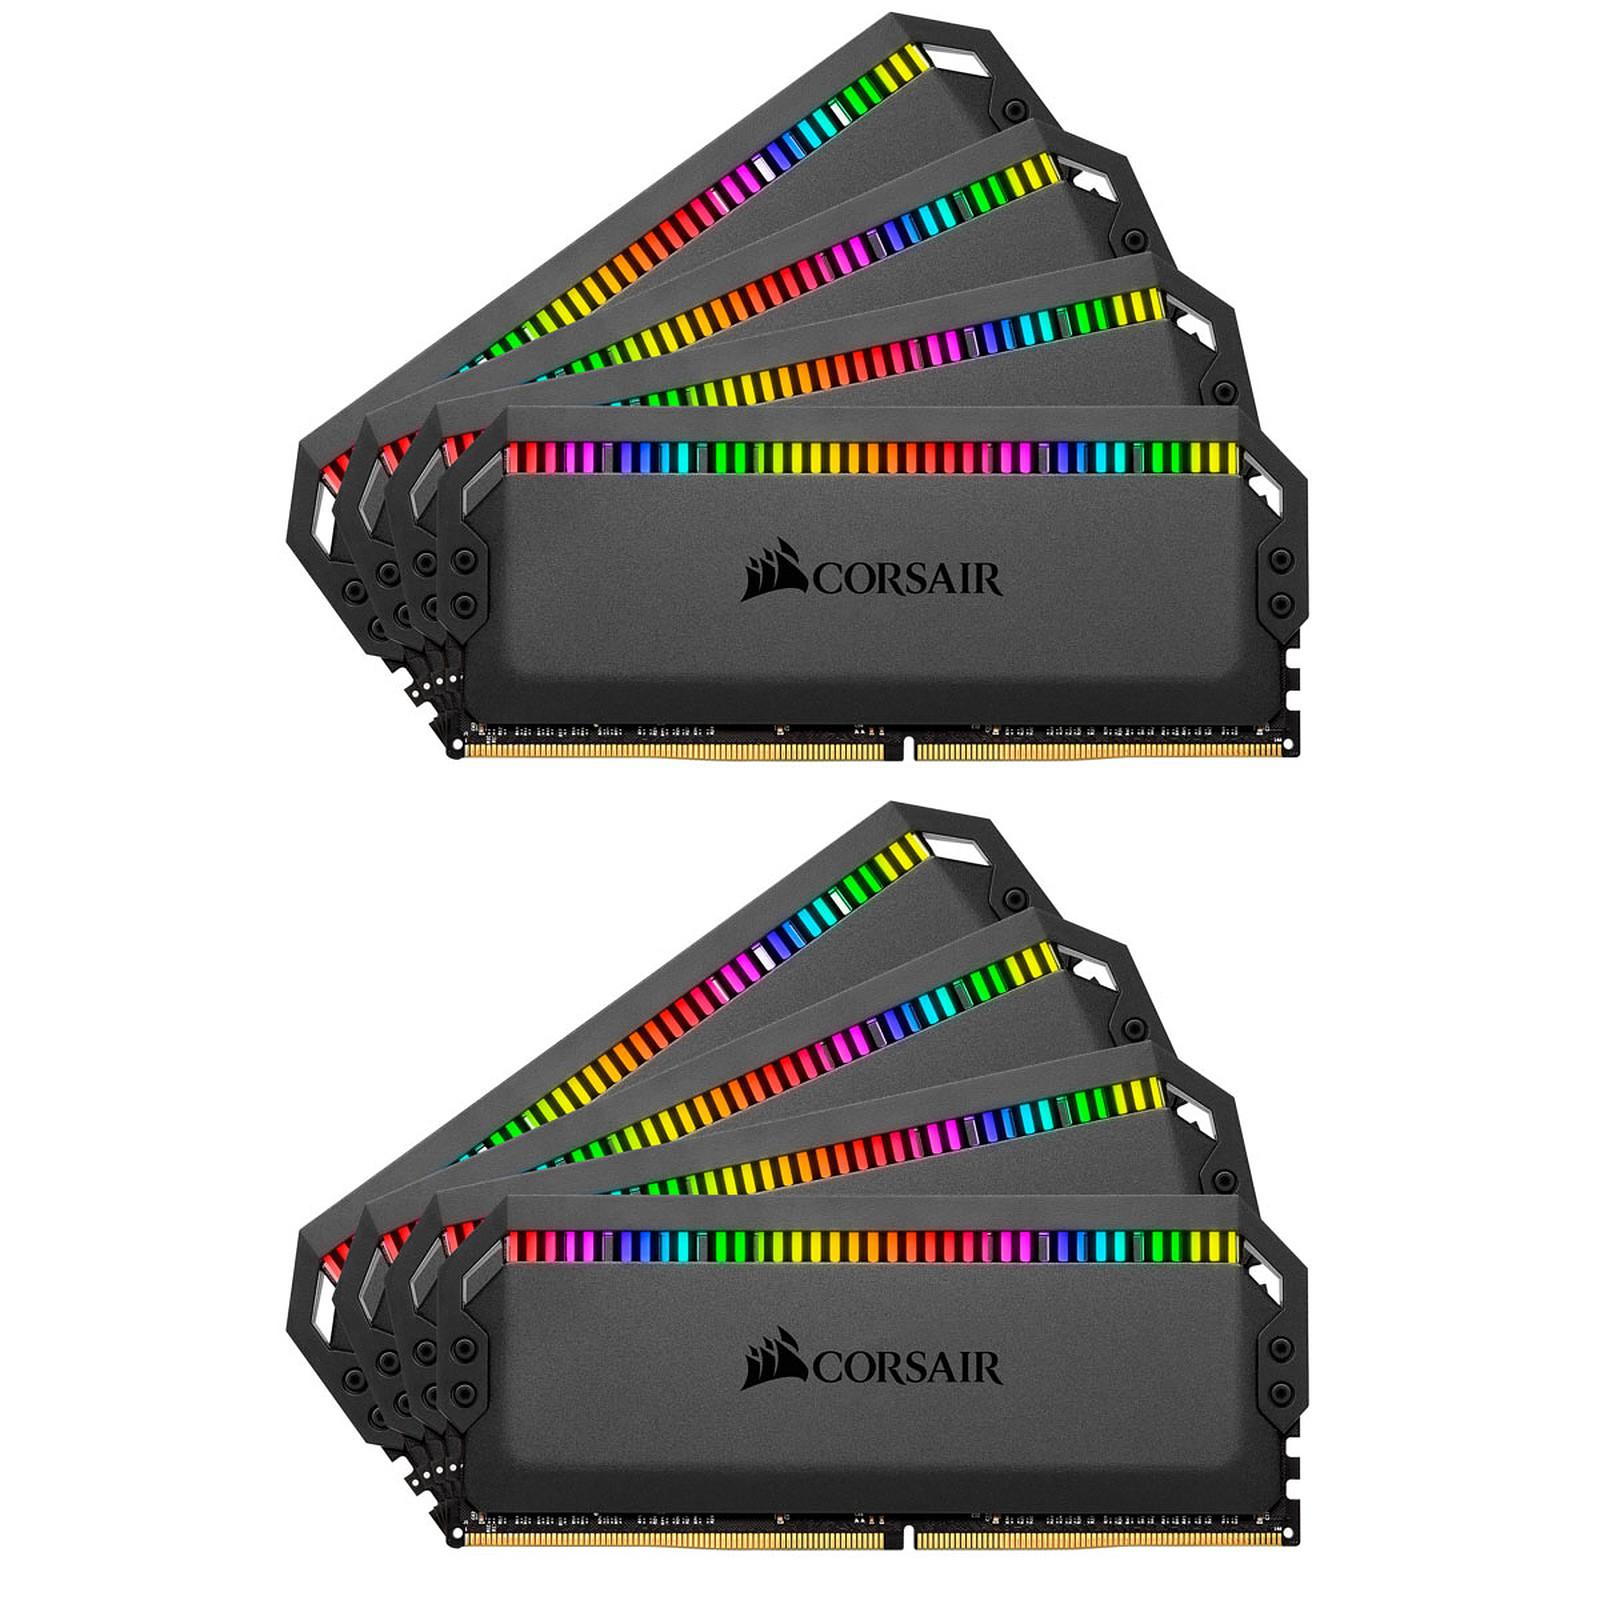 Corsair Dominator Platinum RGB 128 Go (8x 16 Go) DDR4 3200 MHz CL16